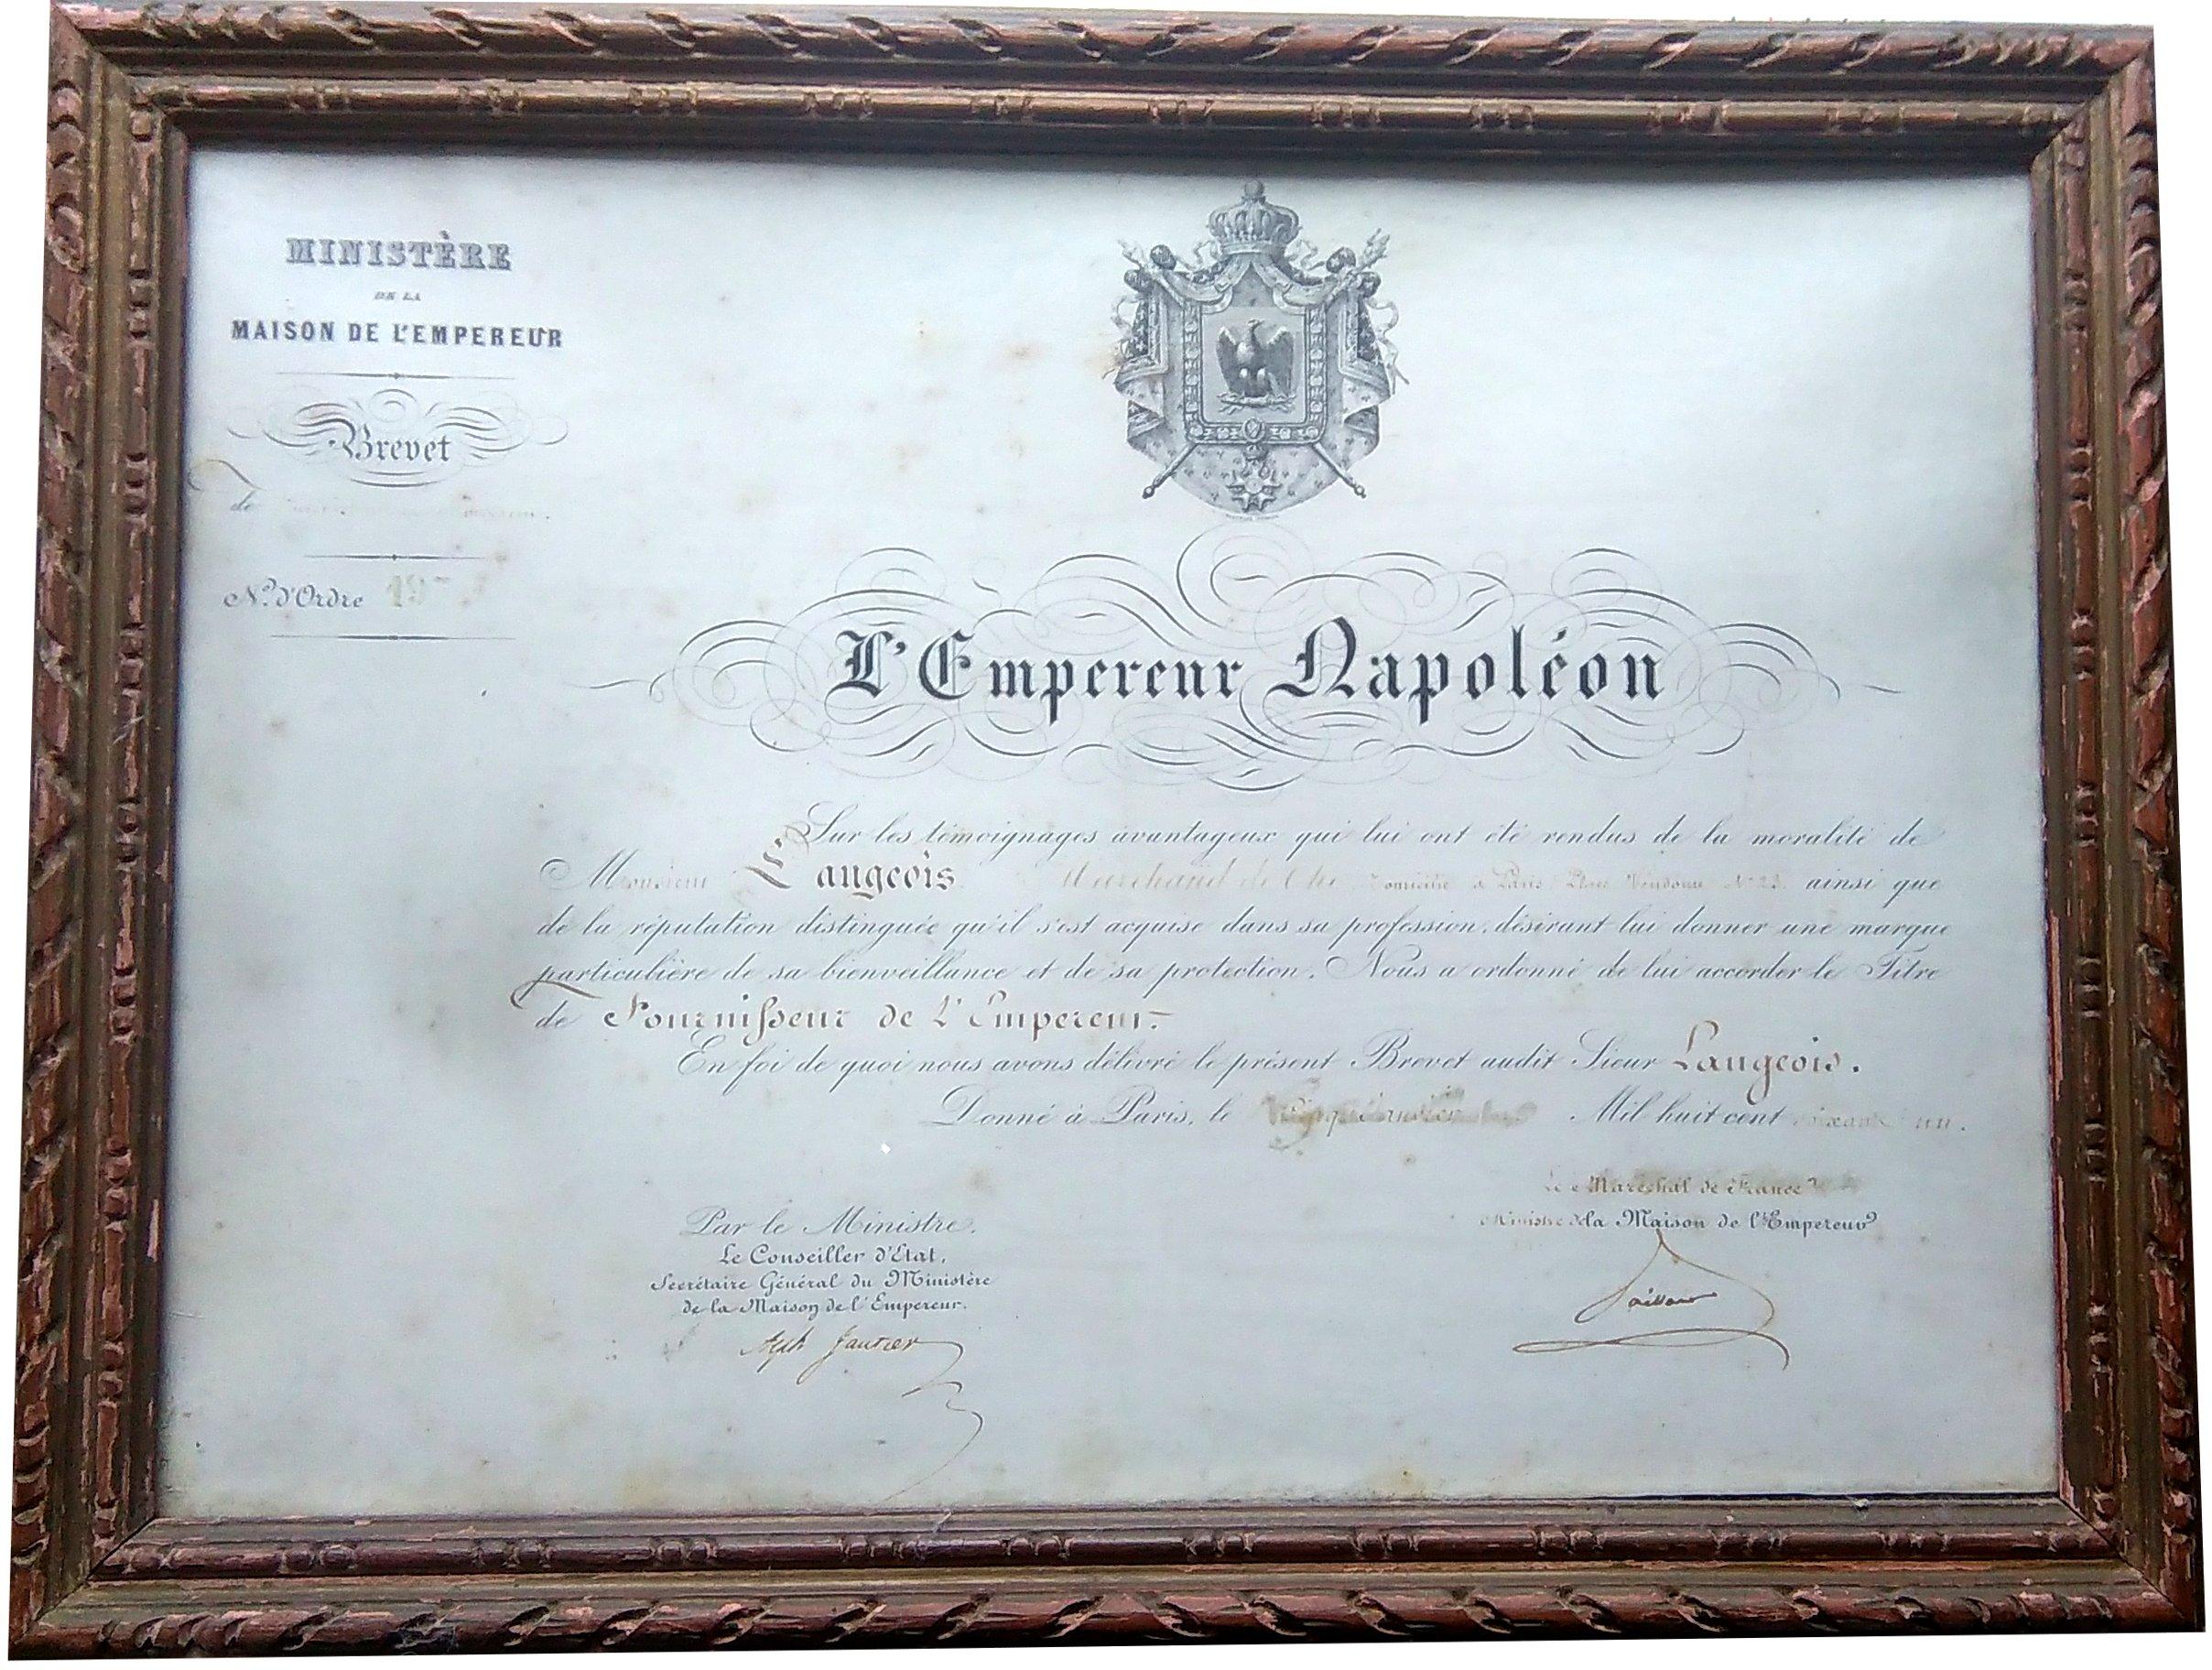 Fournisseur de Napoléon III